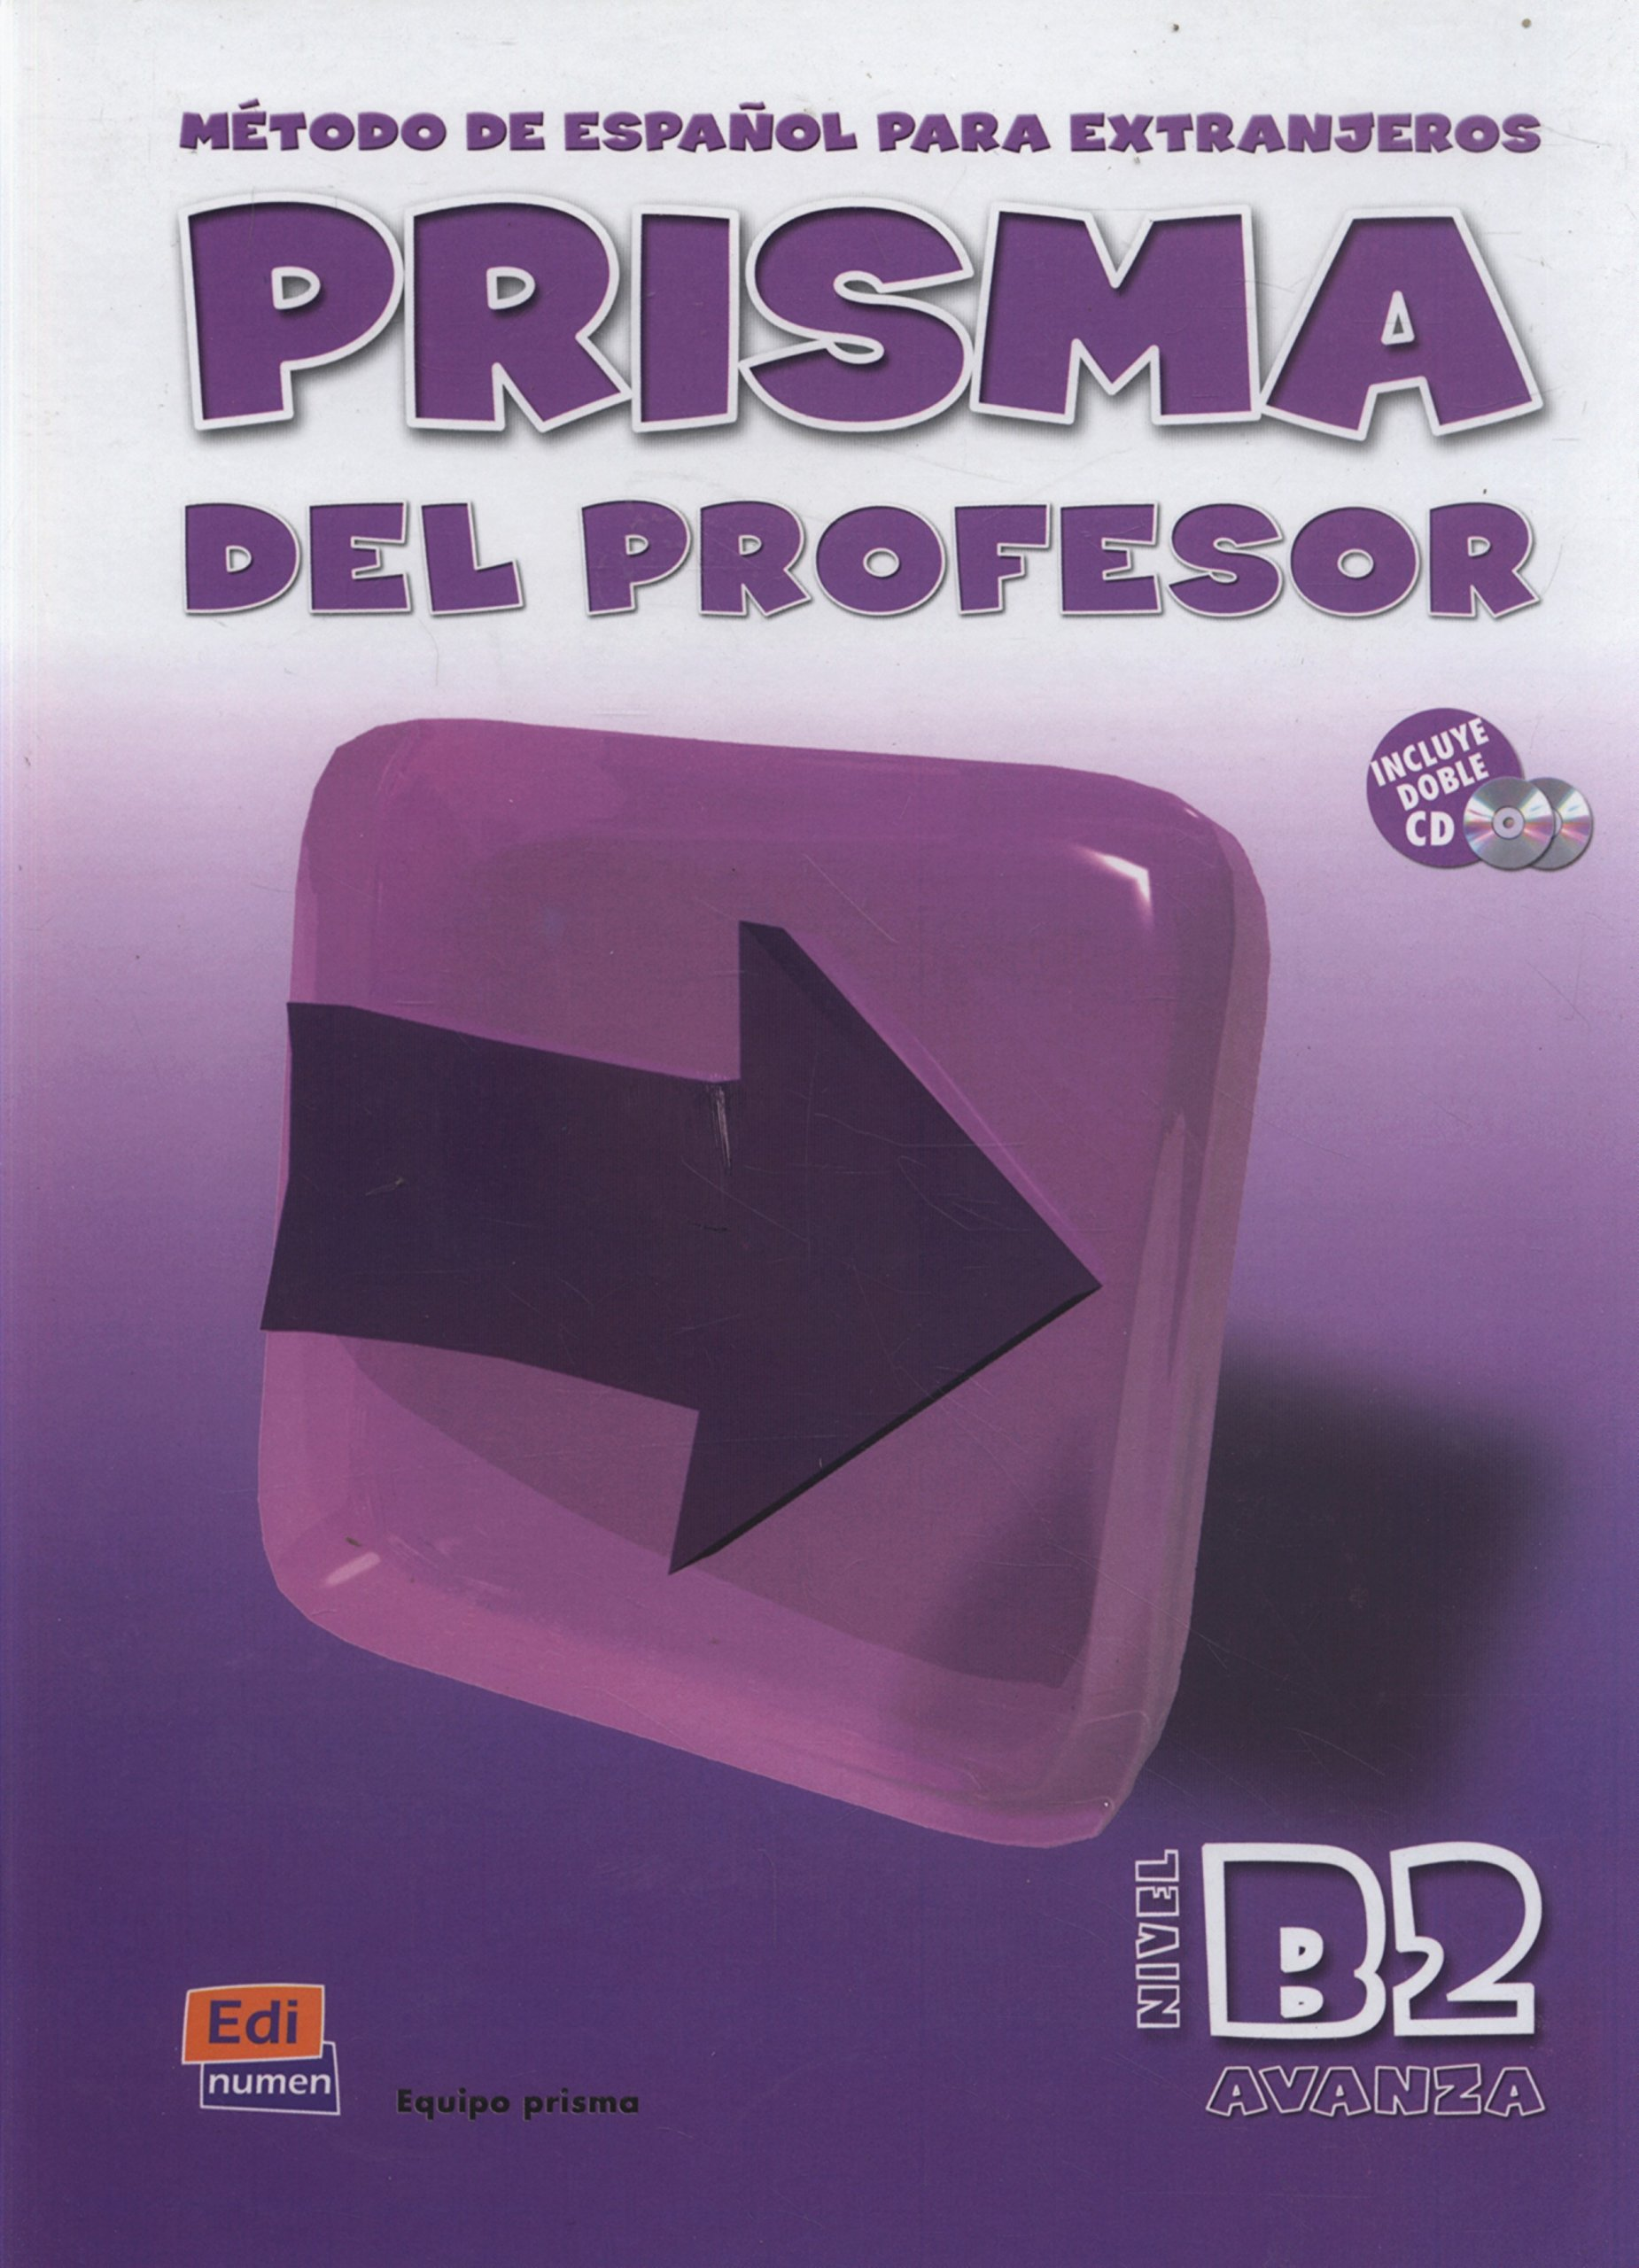 Download Prisma B2 Avanza, Del Profesor / Prisma B2 Avanza, For the Professor: Metodo de Espanol para Extranjeros / Method of Spanish for Foreigners (Spanish Edition) PDF